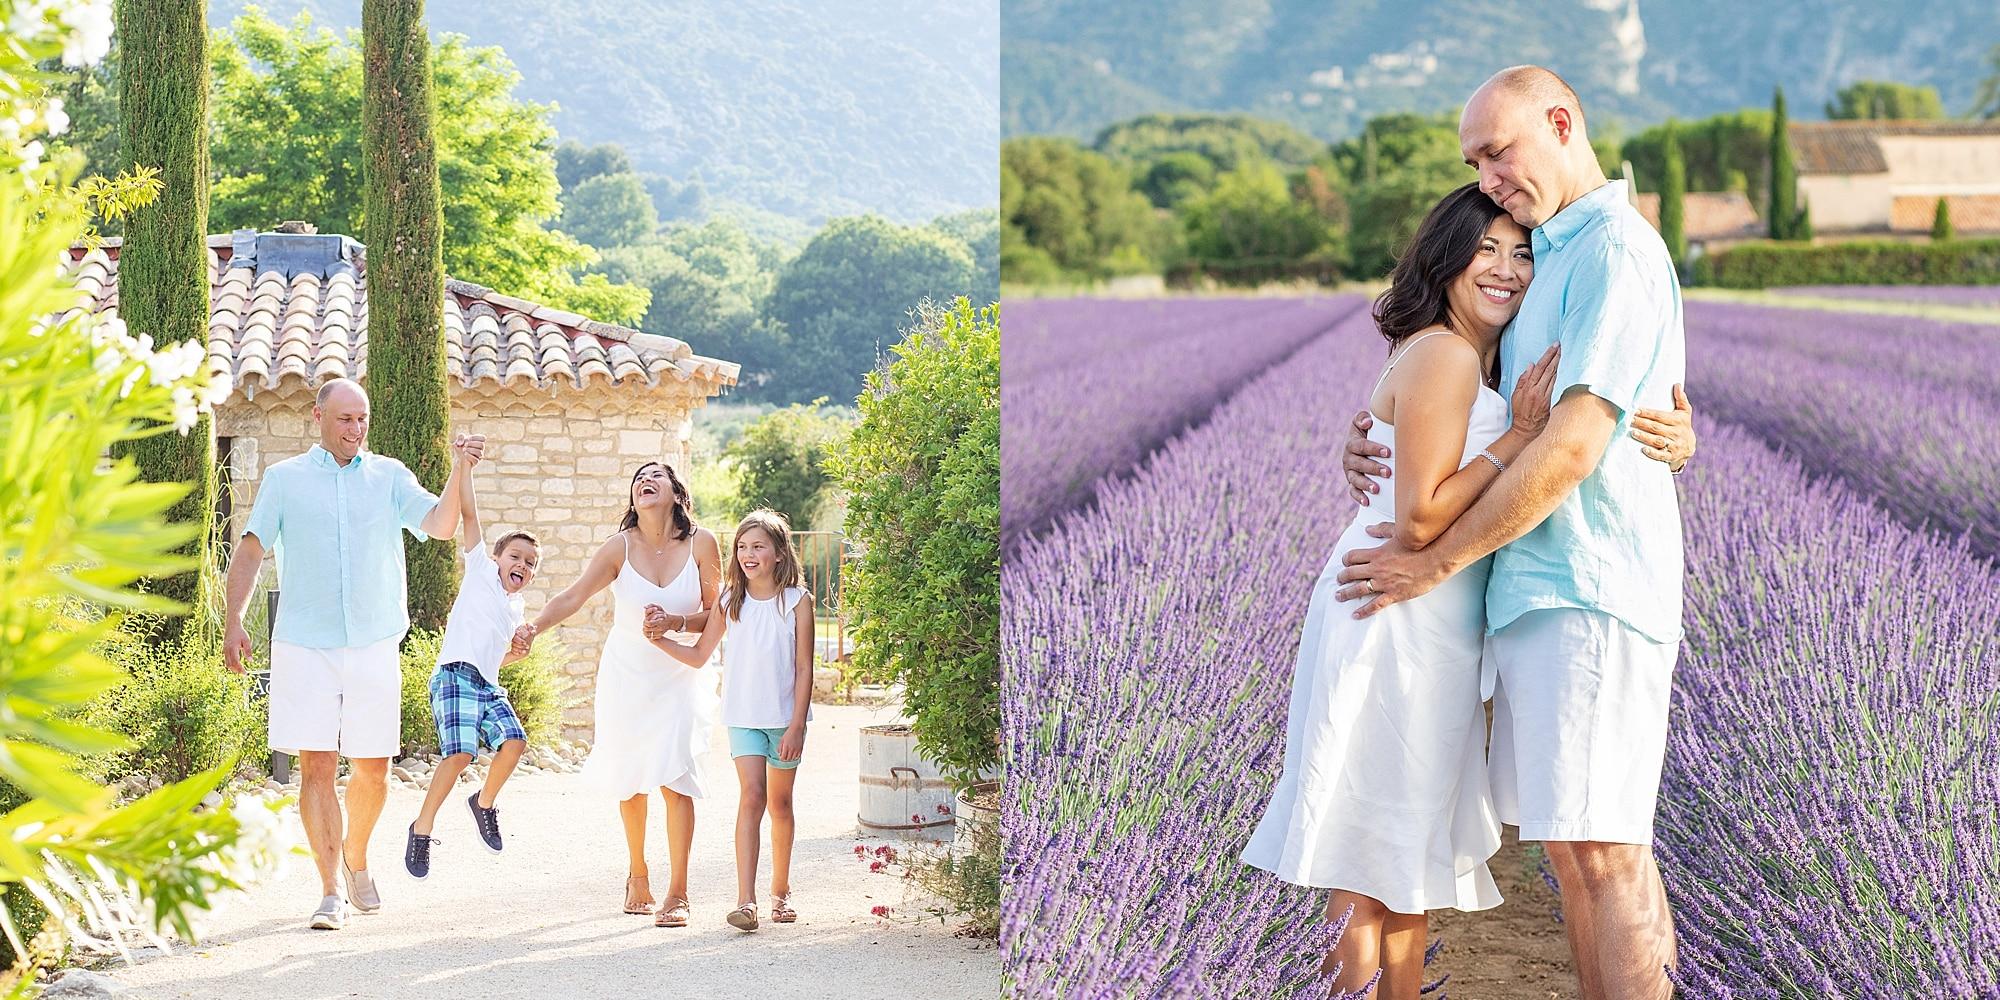 Marie-Calfopoulos-Paris-Provence-Photographer-photographe-wedding-mariage-elopement-family-lavender-luberon-Avignon-Provence_0002